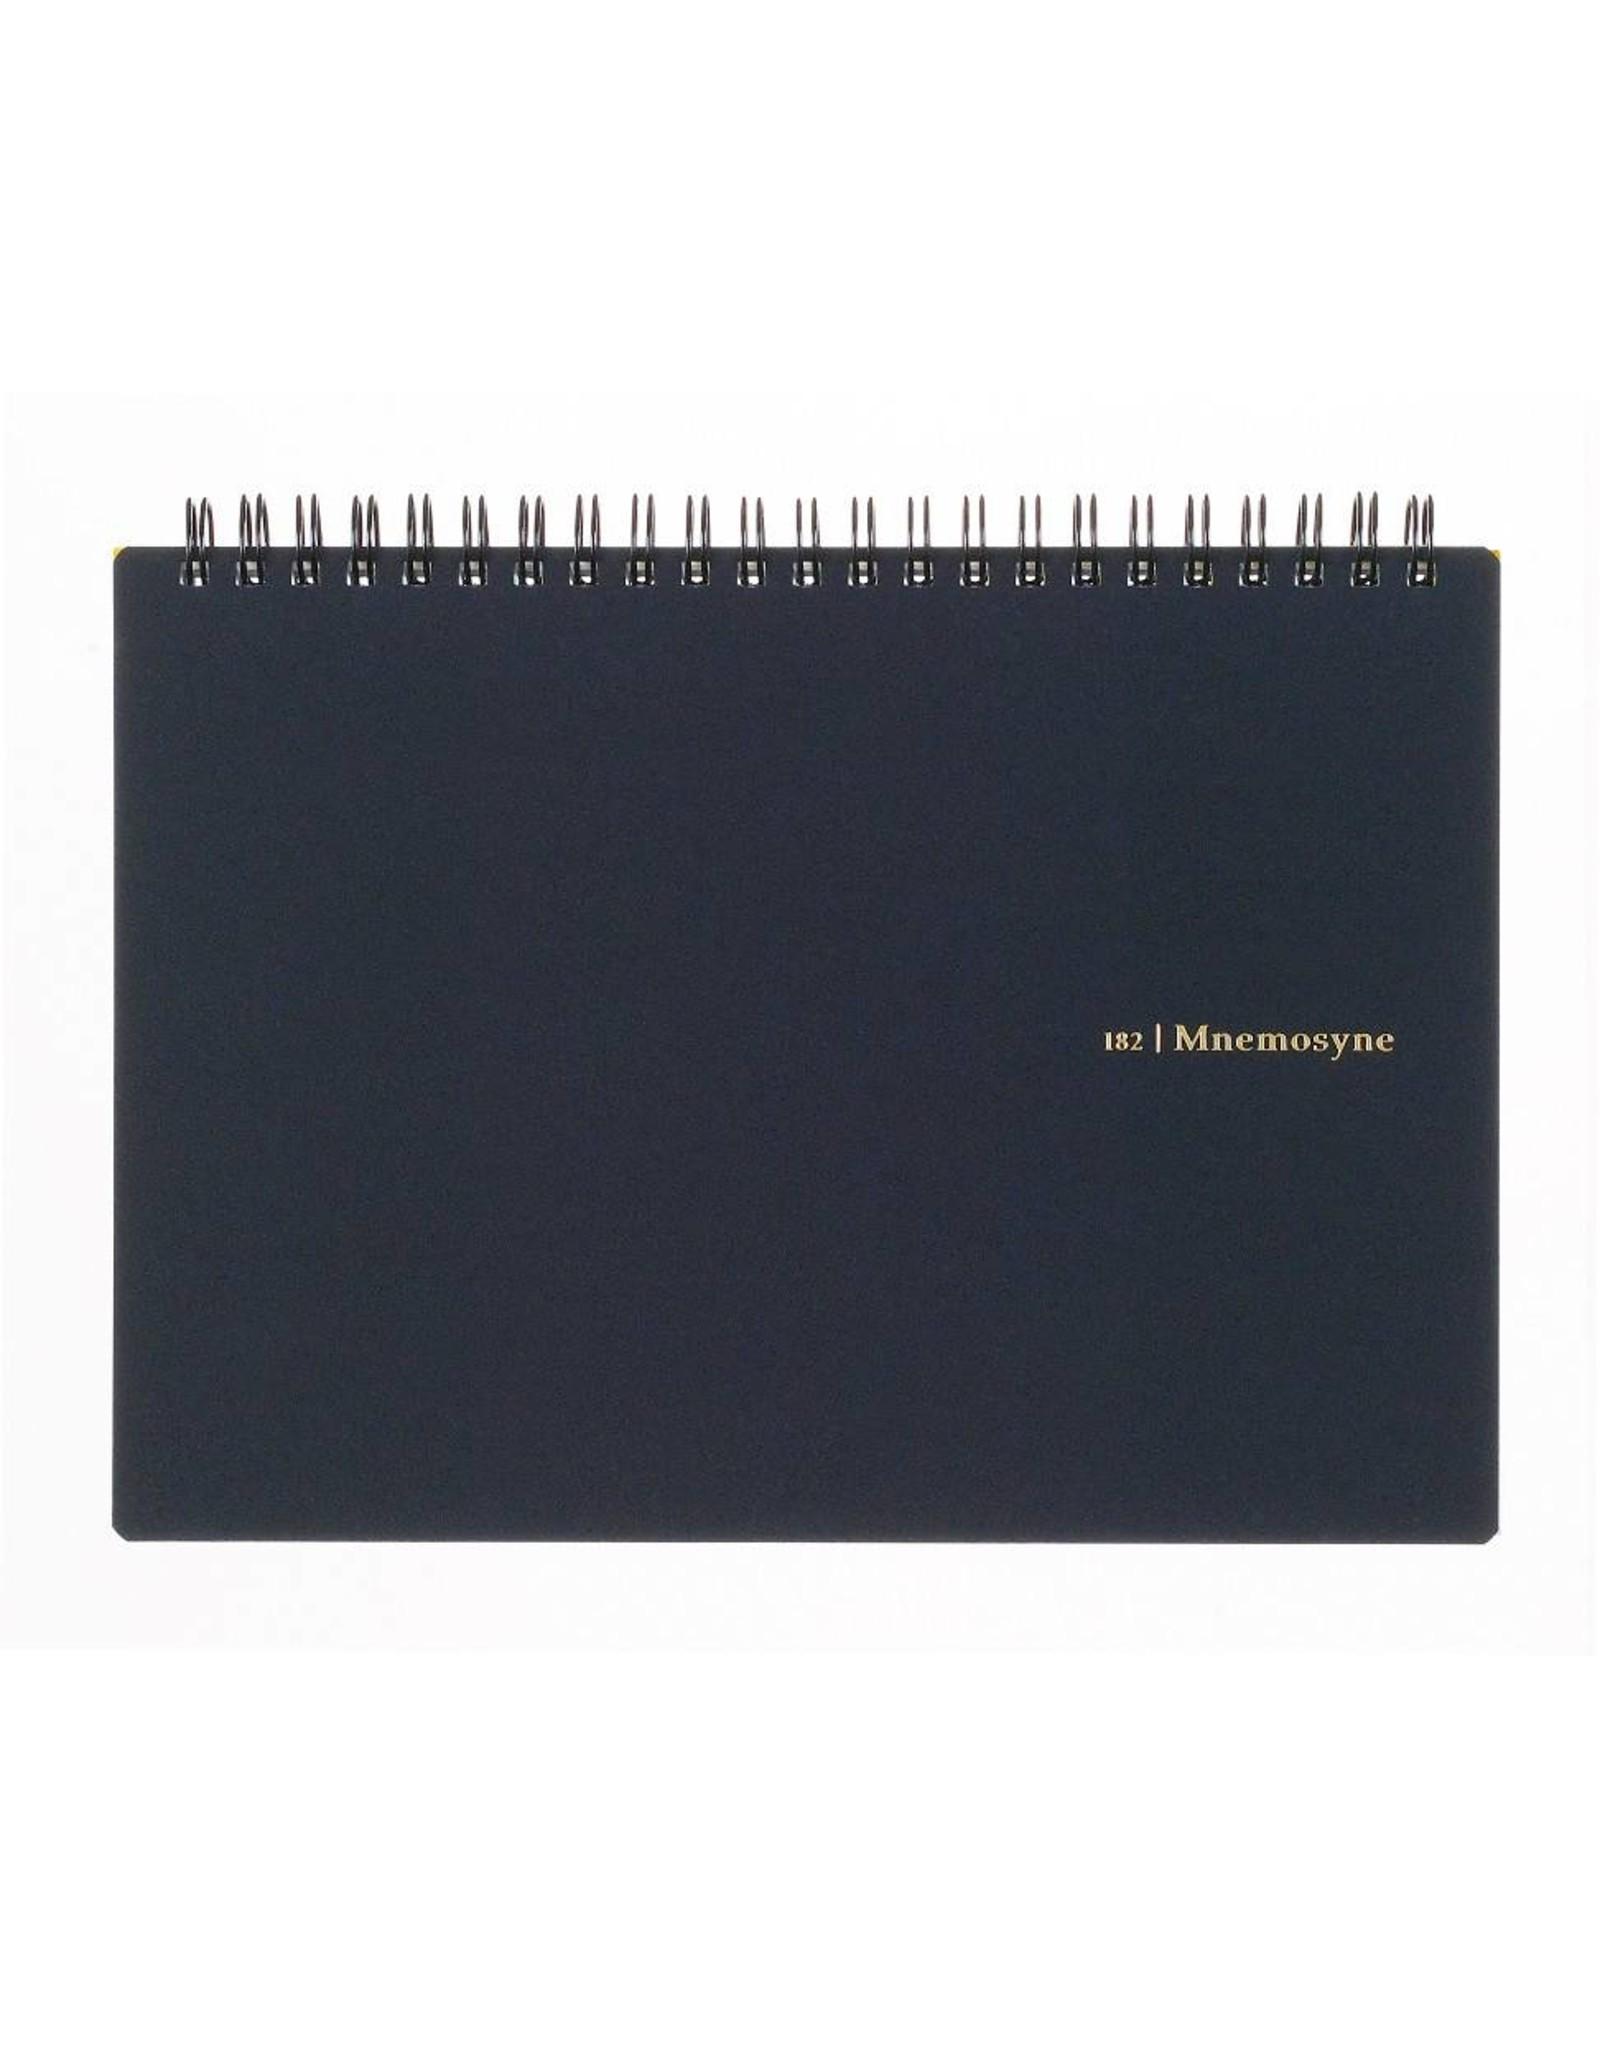 MARUMAN N182A MNEMOSYNE NOTEBOOK 5MM SQUARED A5